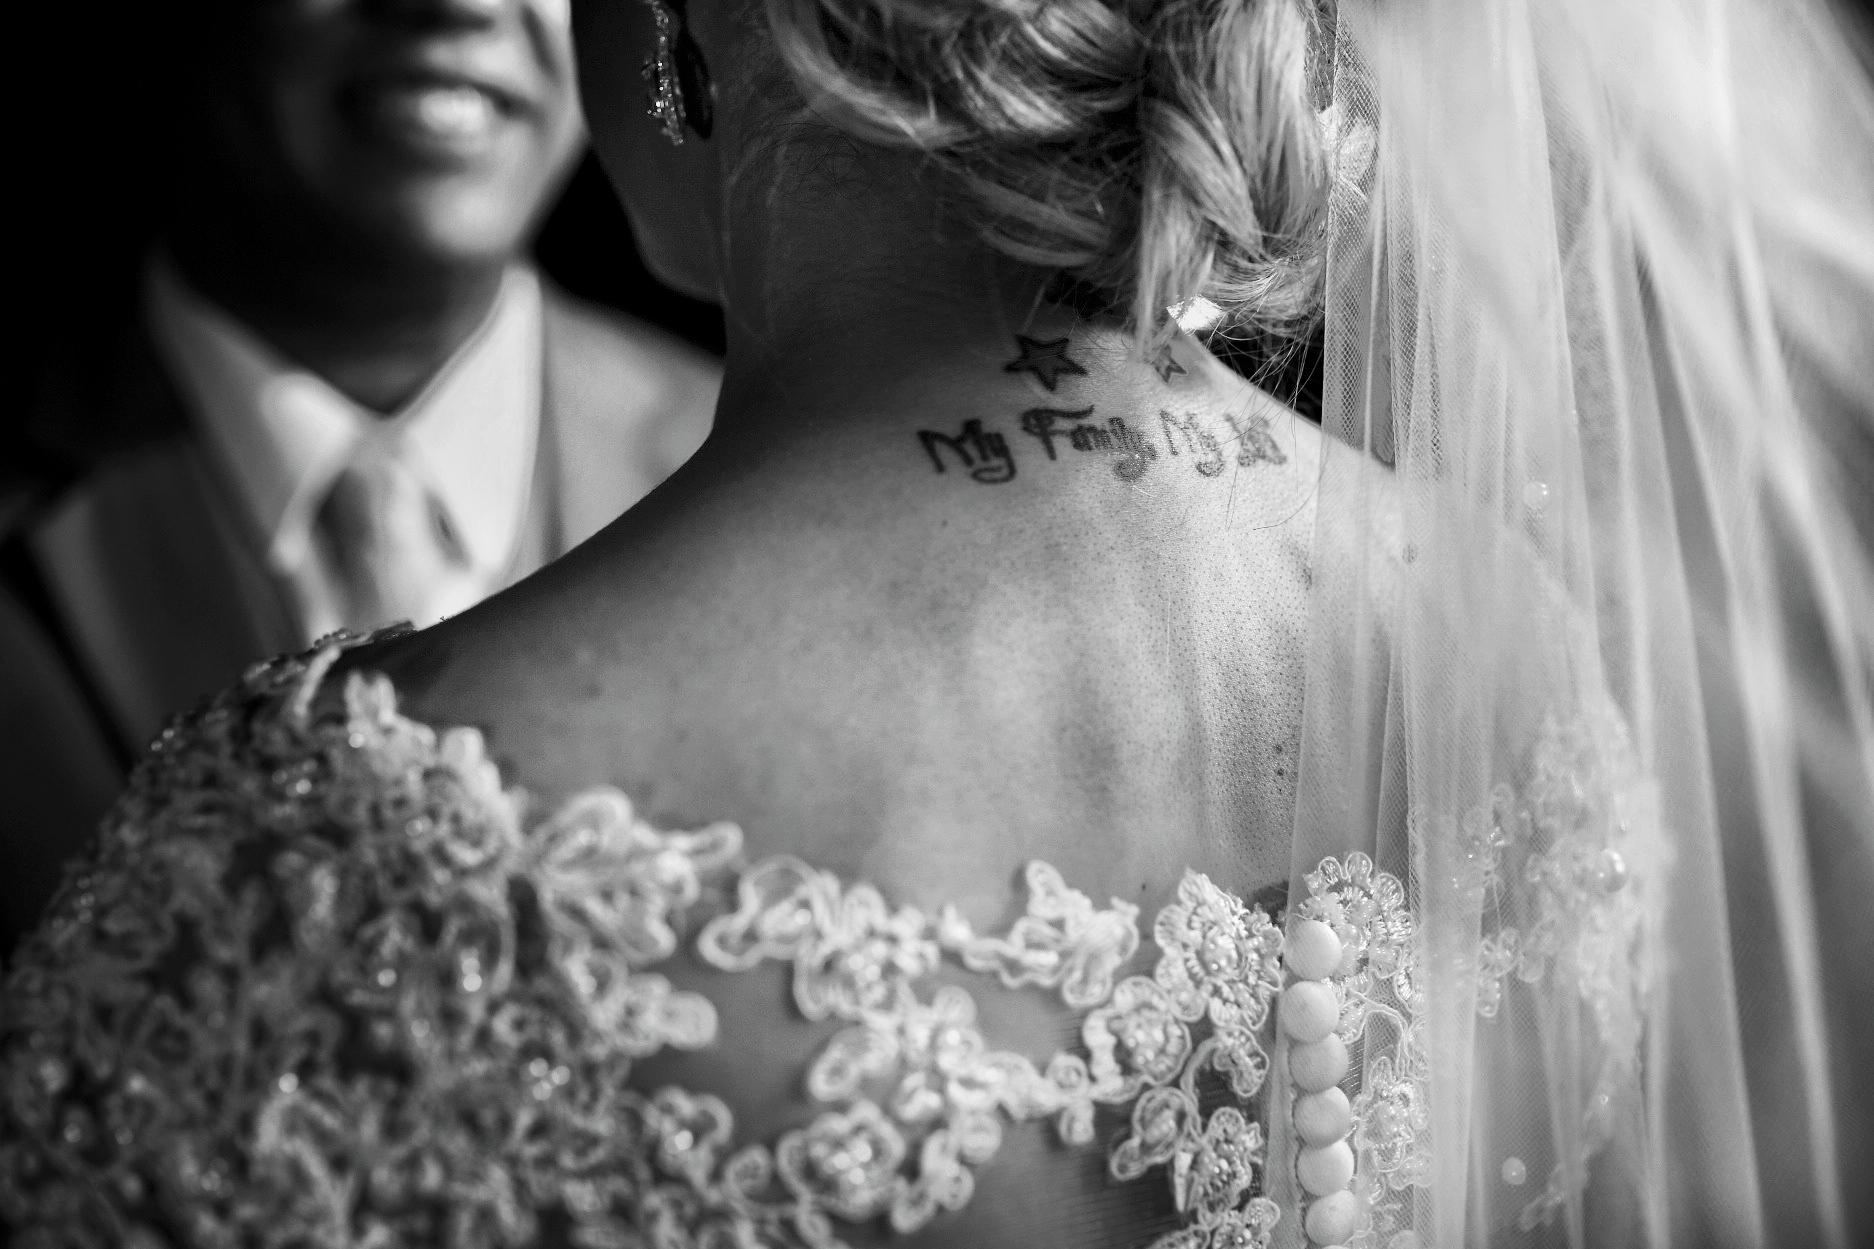 Contate Fotógrafo de Casamento Jundiaí, Campinas, Itatiba, Atibaia e SP | Chris Polizello